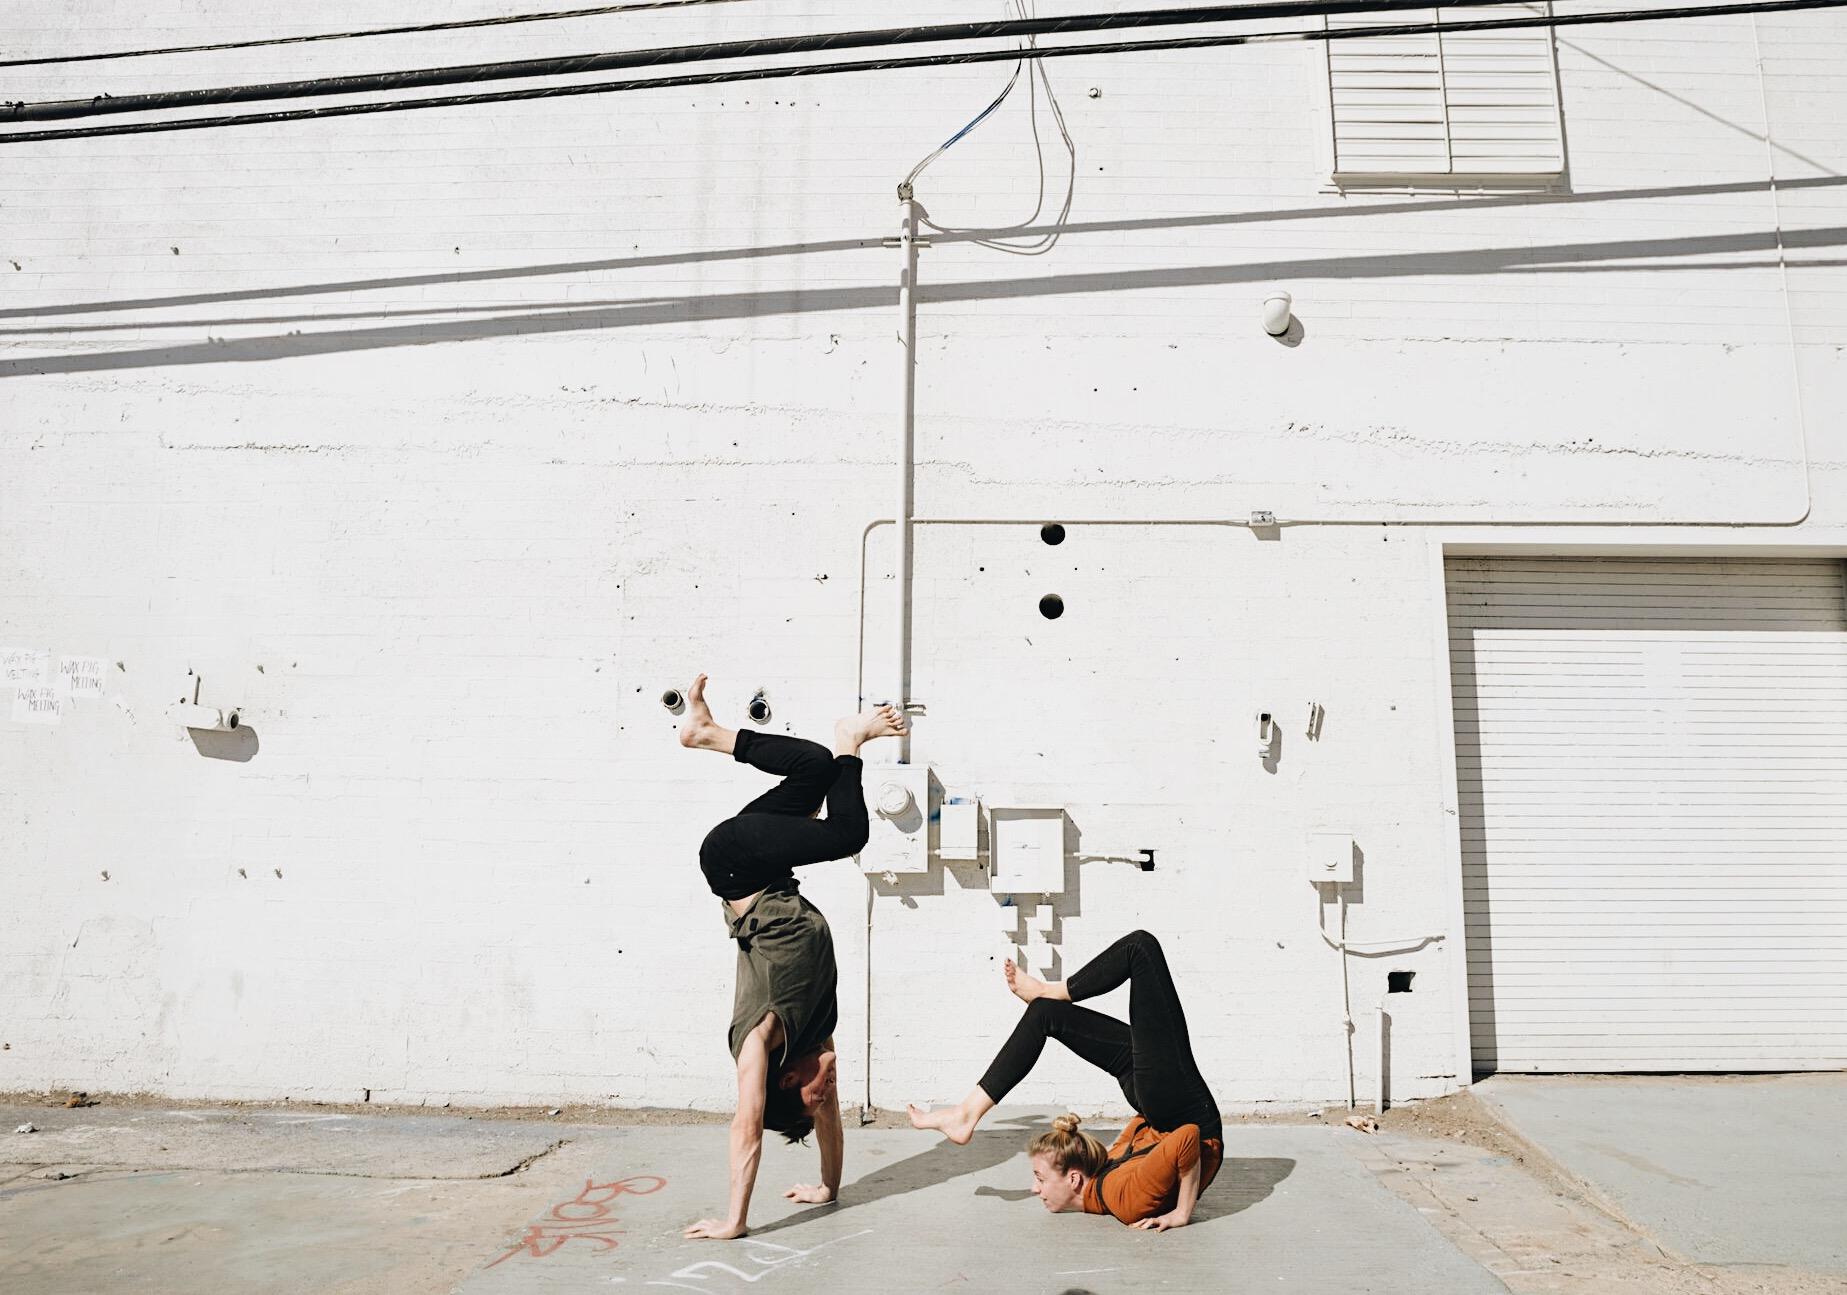 Photo by Mai Sato